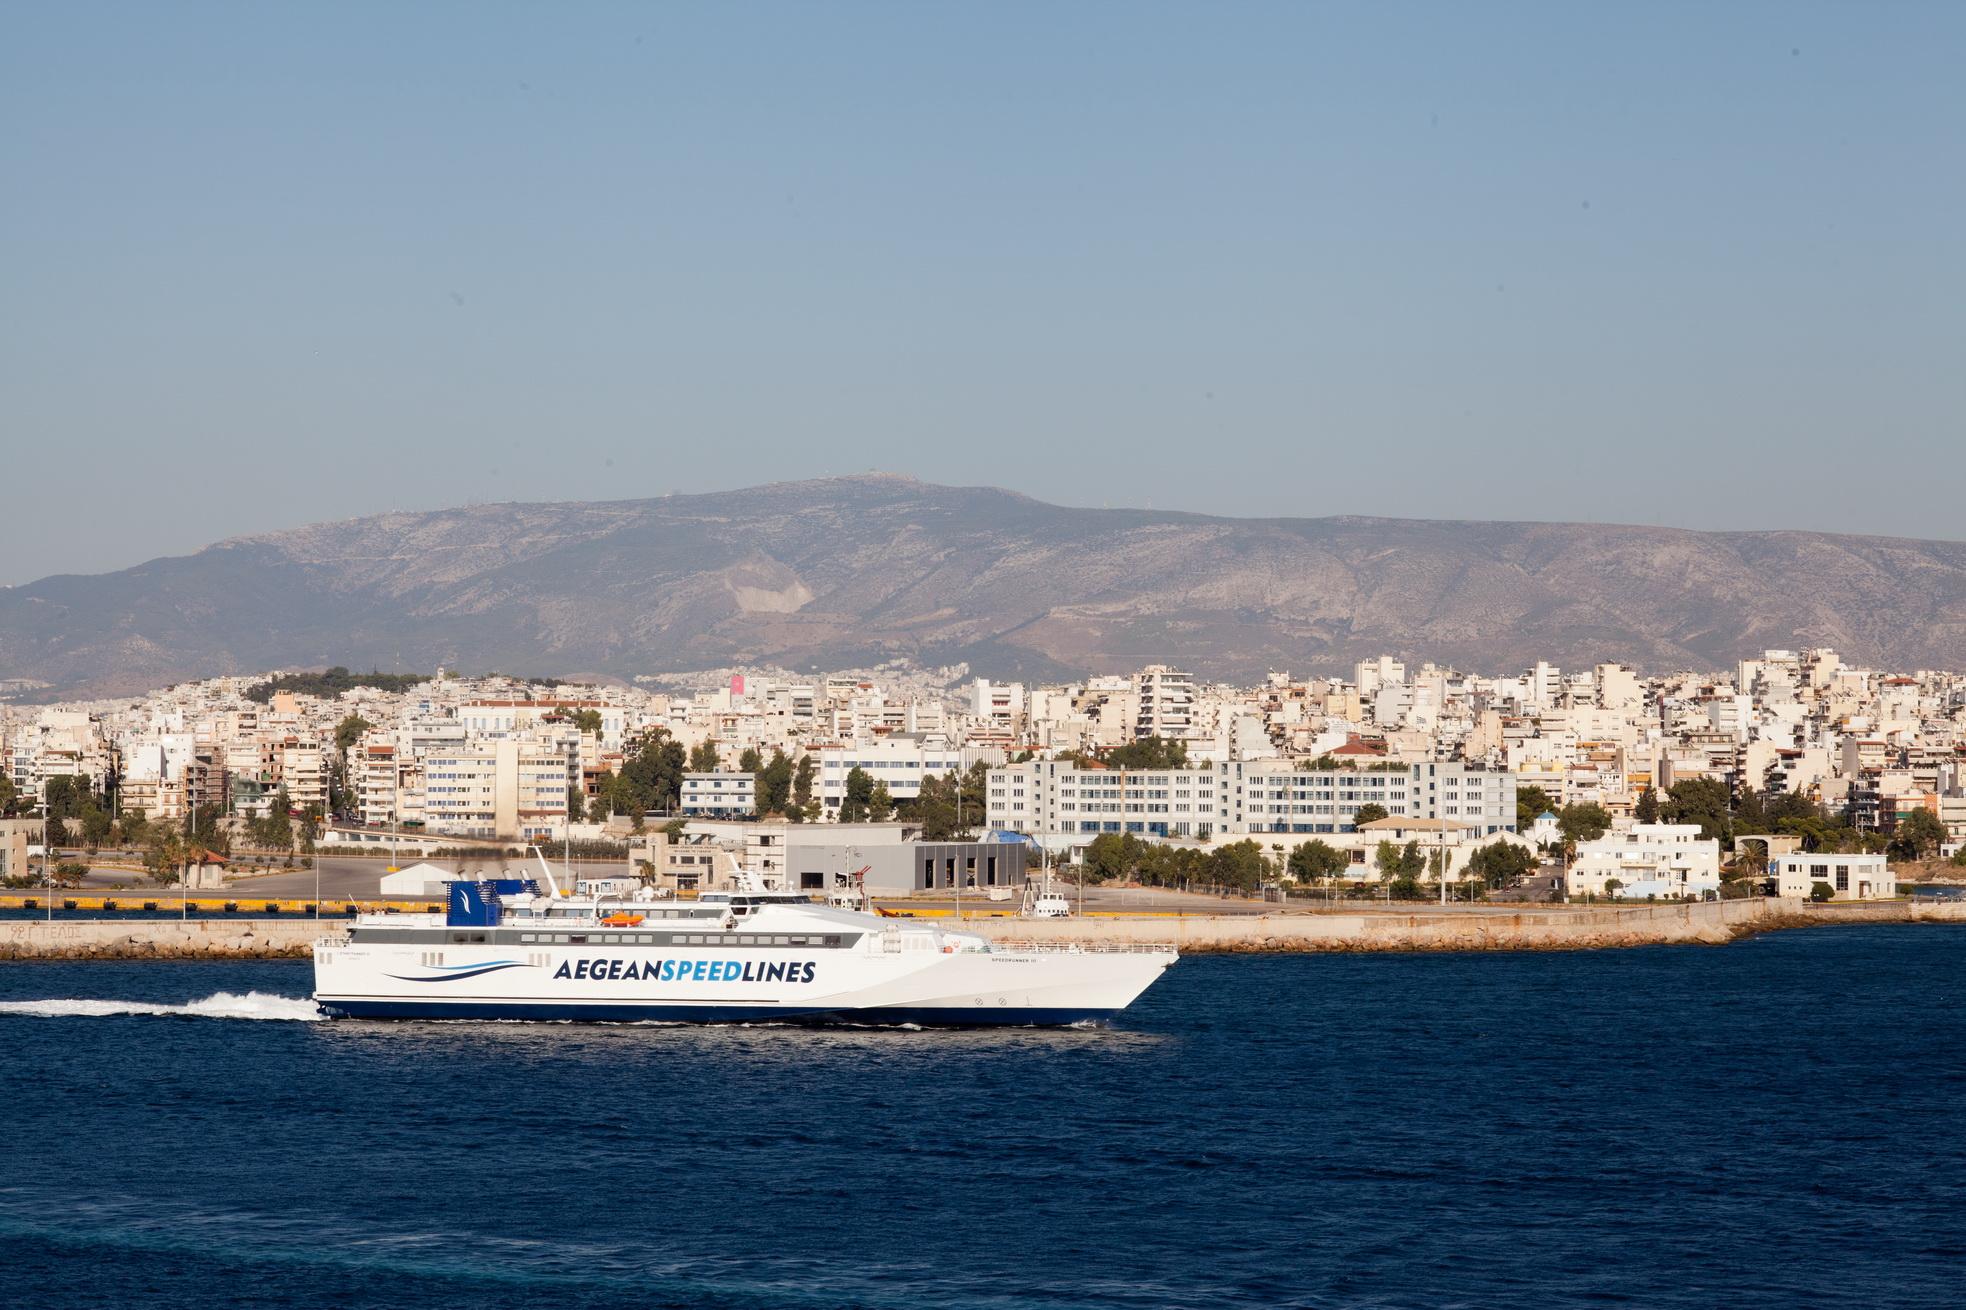 MS Speedrunner III IMO 9141871 Aegean Speed Lines leaving Piraeus Port of Athens Greece 02